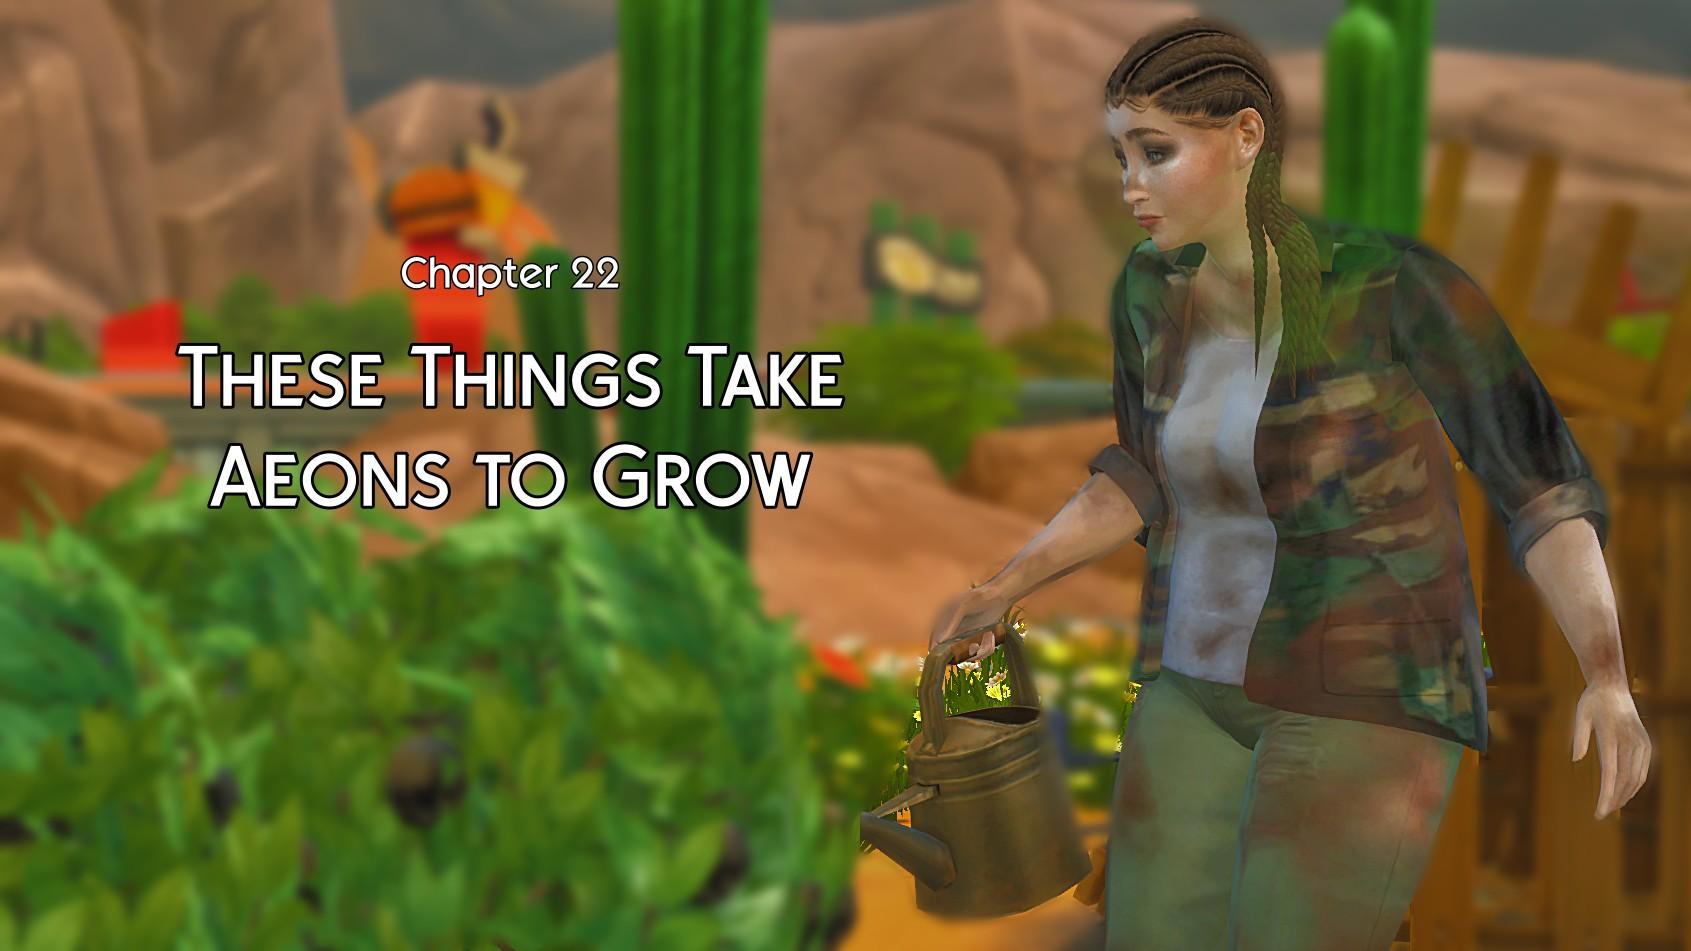 aeons to grow title 2020